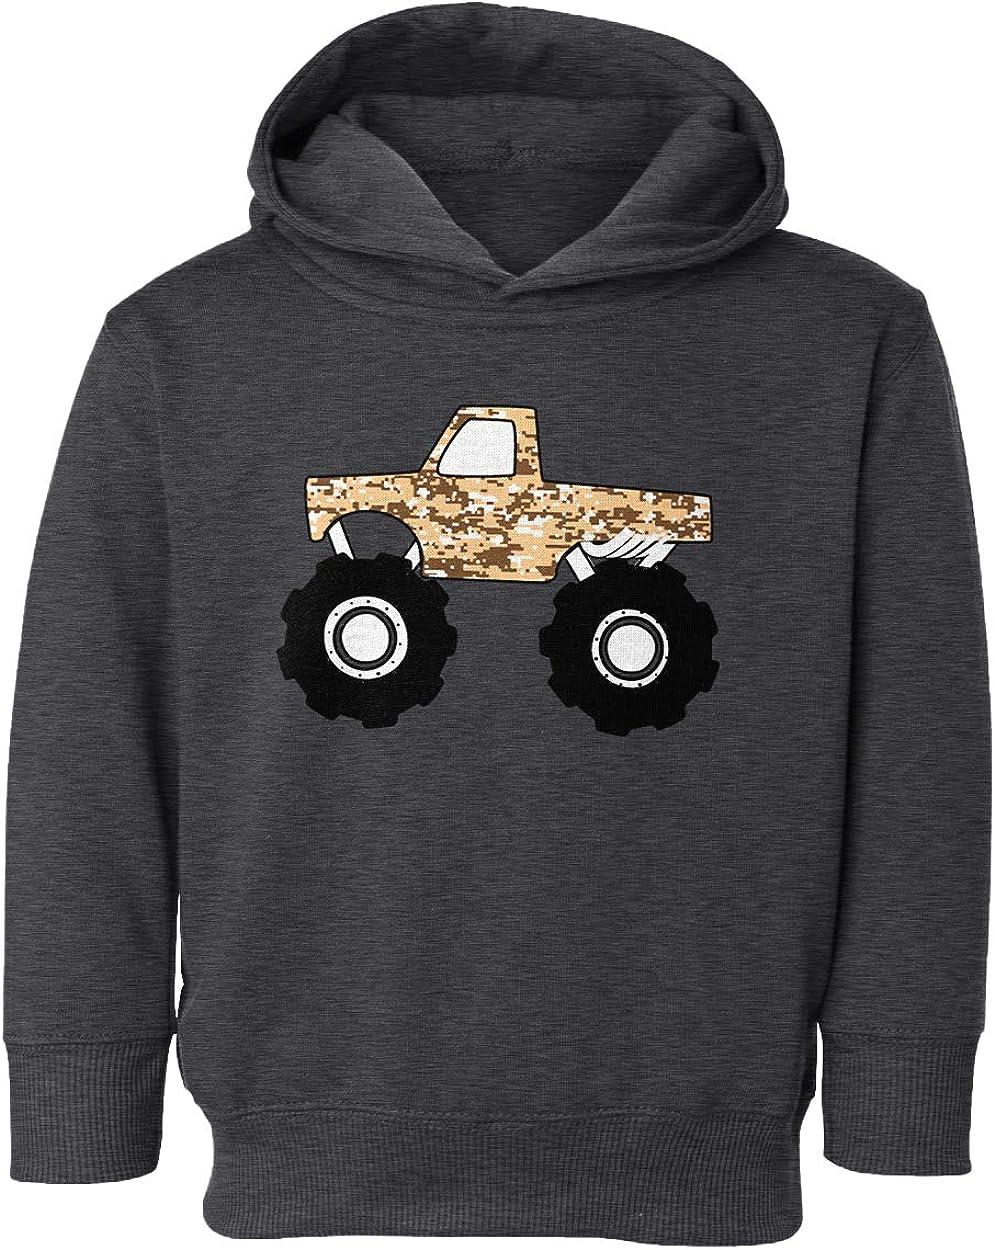 SpiritForged Apparel Desert Camoflauge Monster Truck Toddler Hoodie